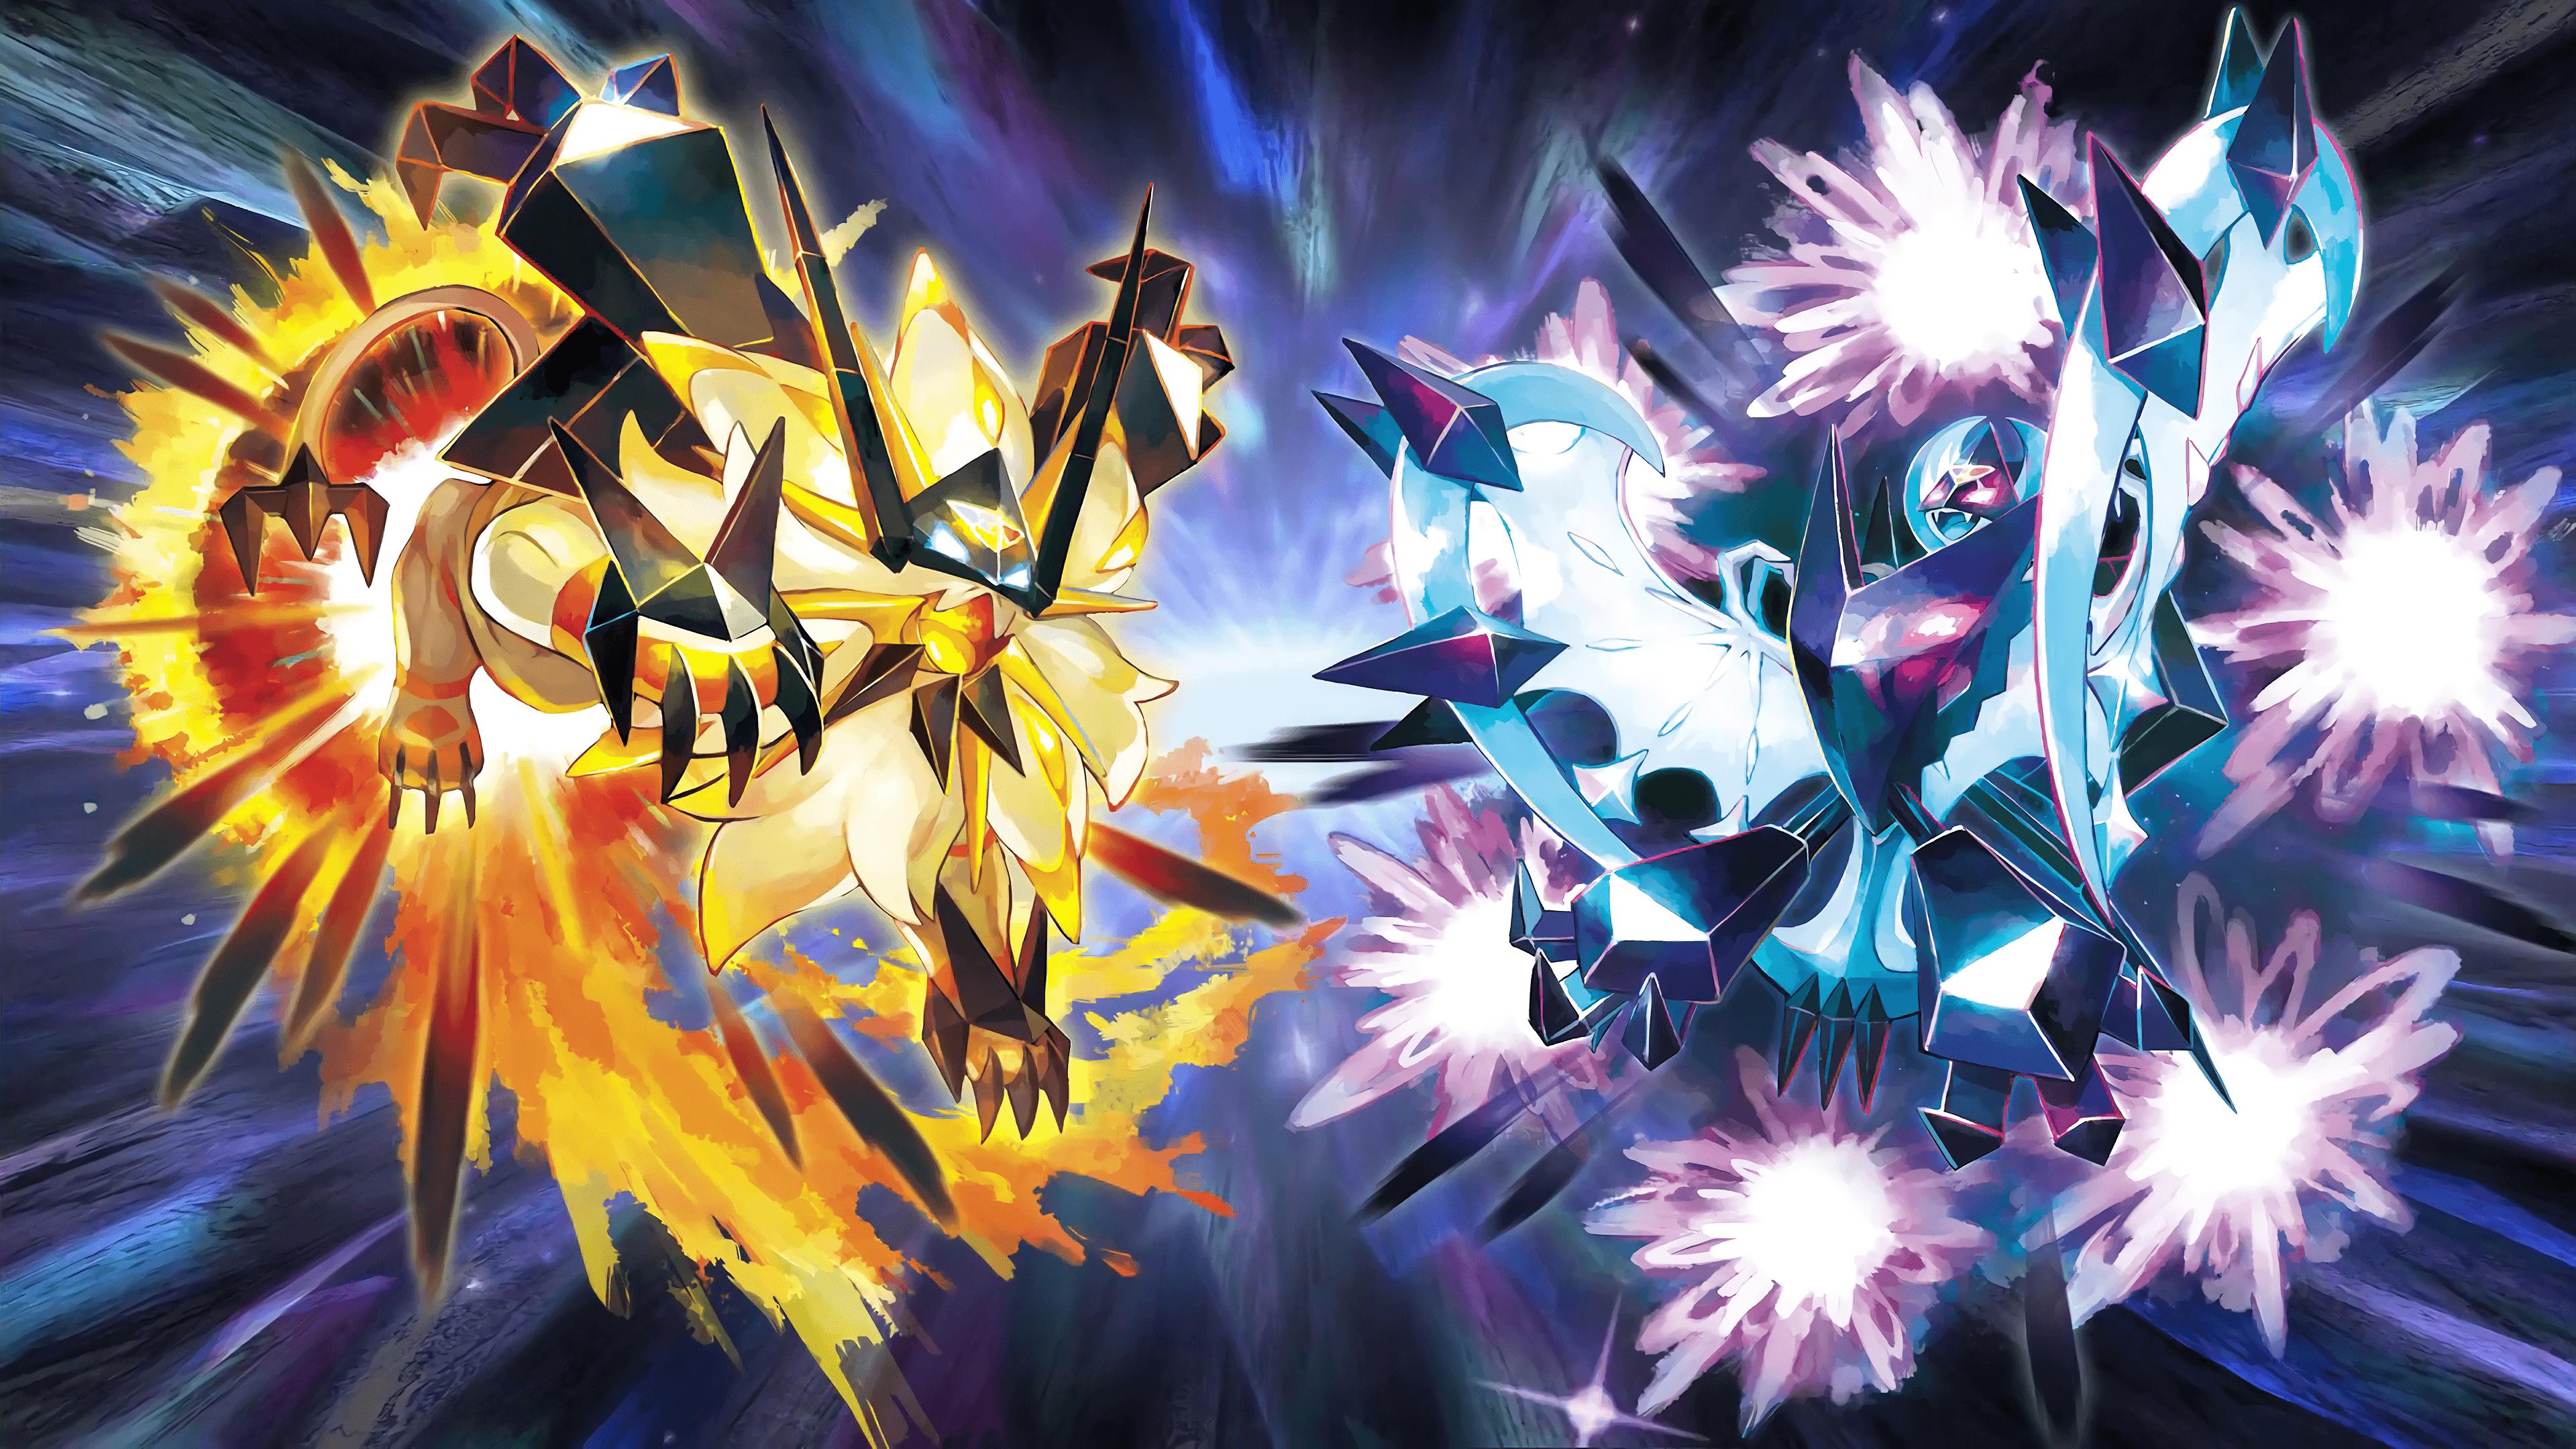 4K Pokemon Wallpapers - Top Free 4K Pokemon Backgrounds ...